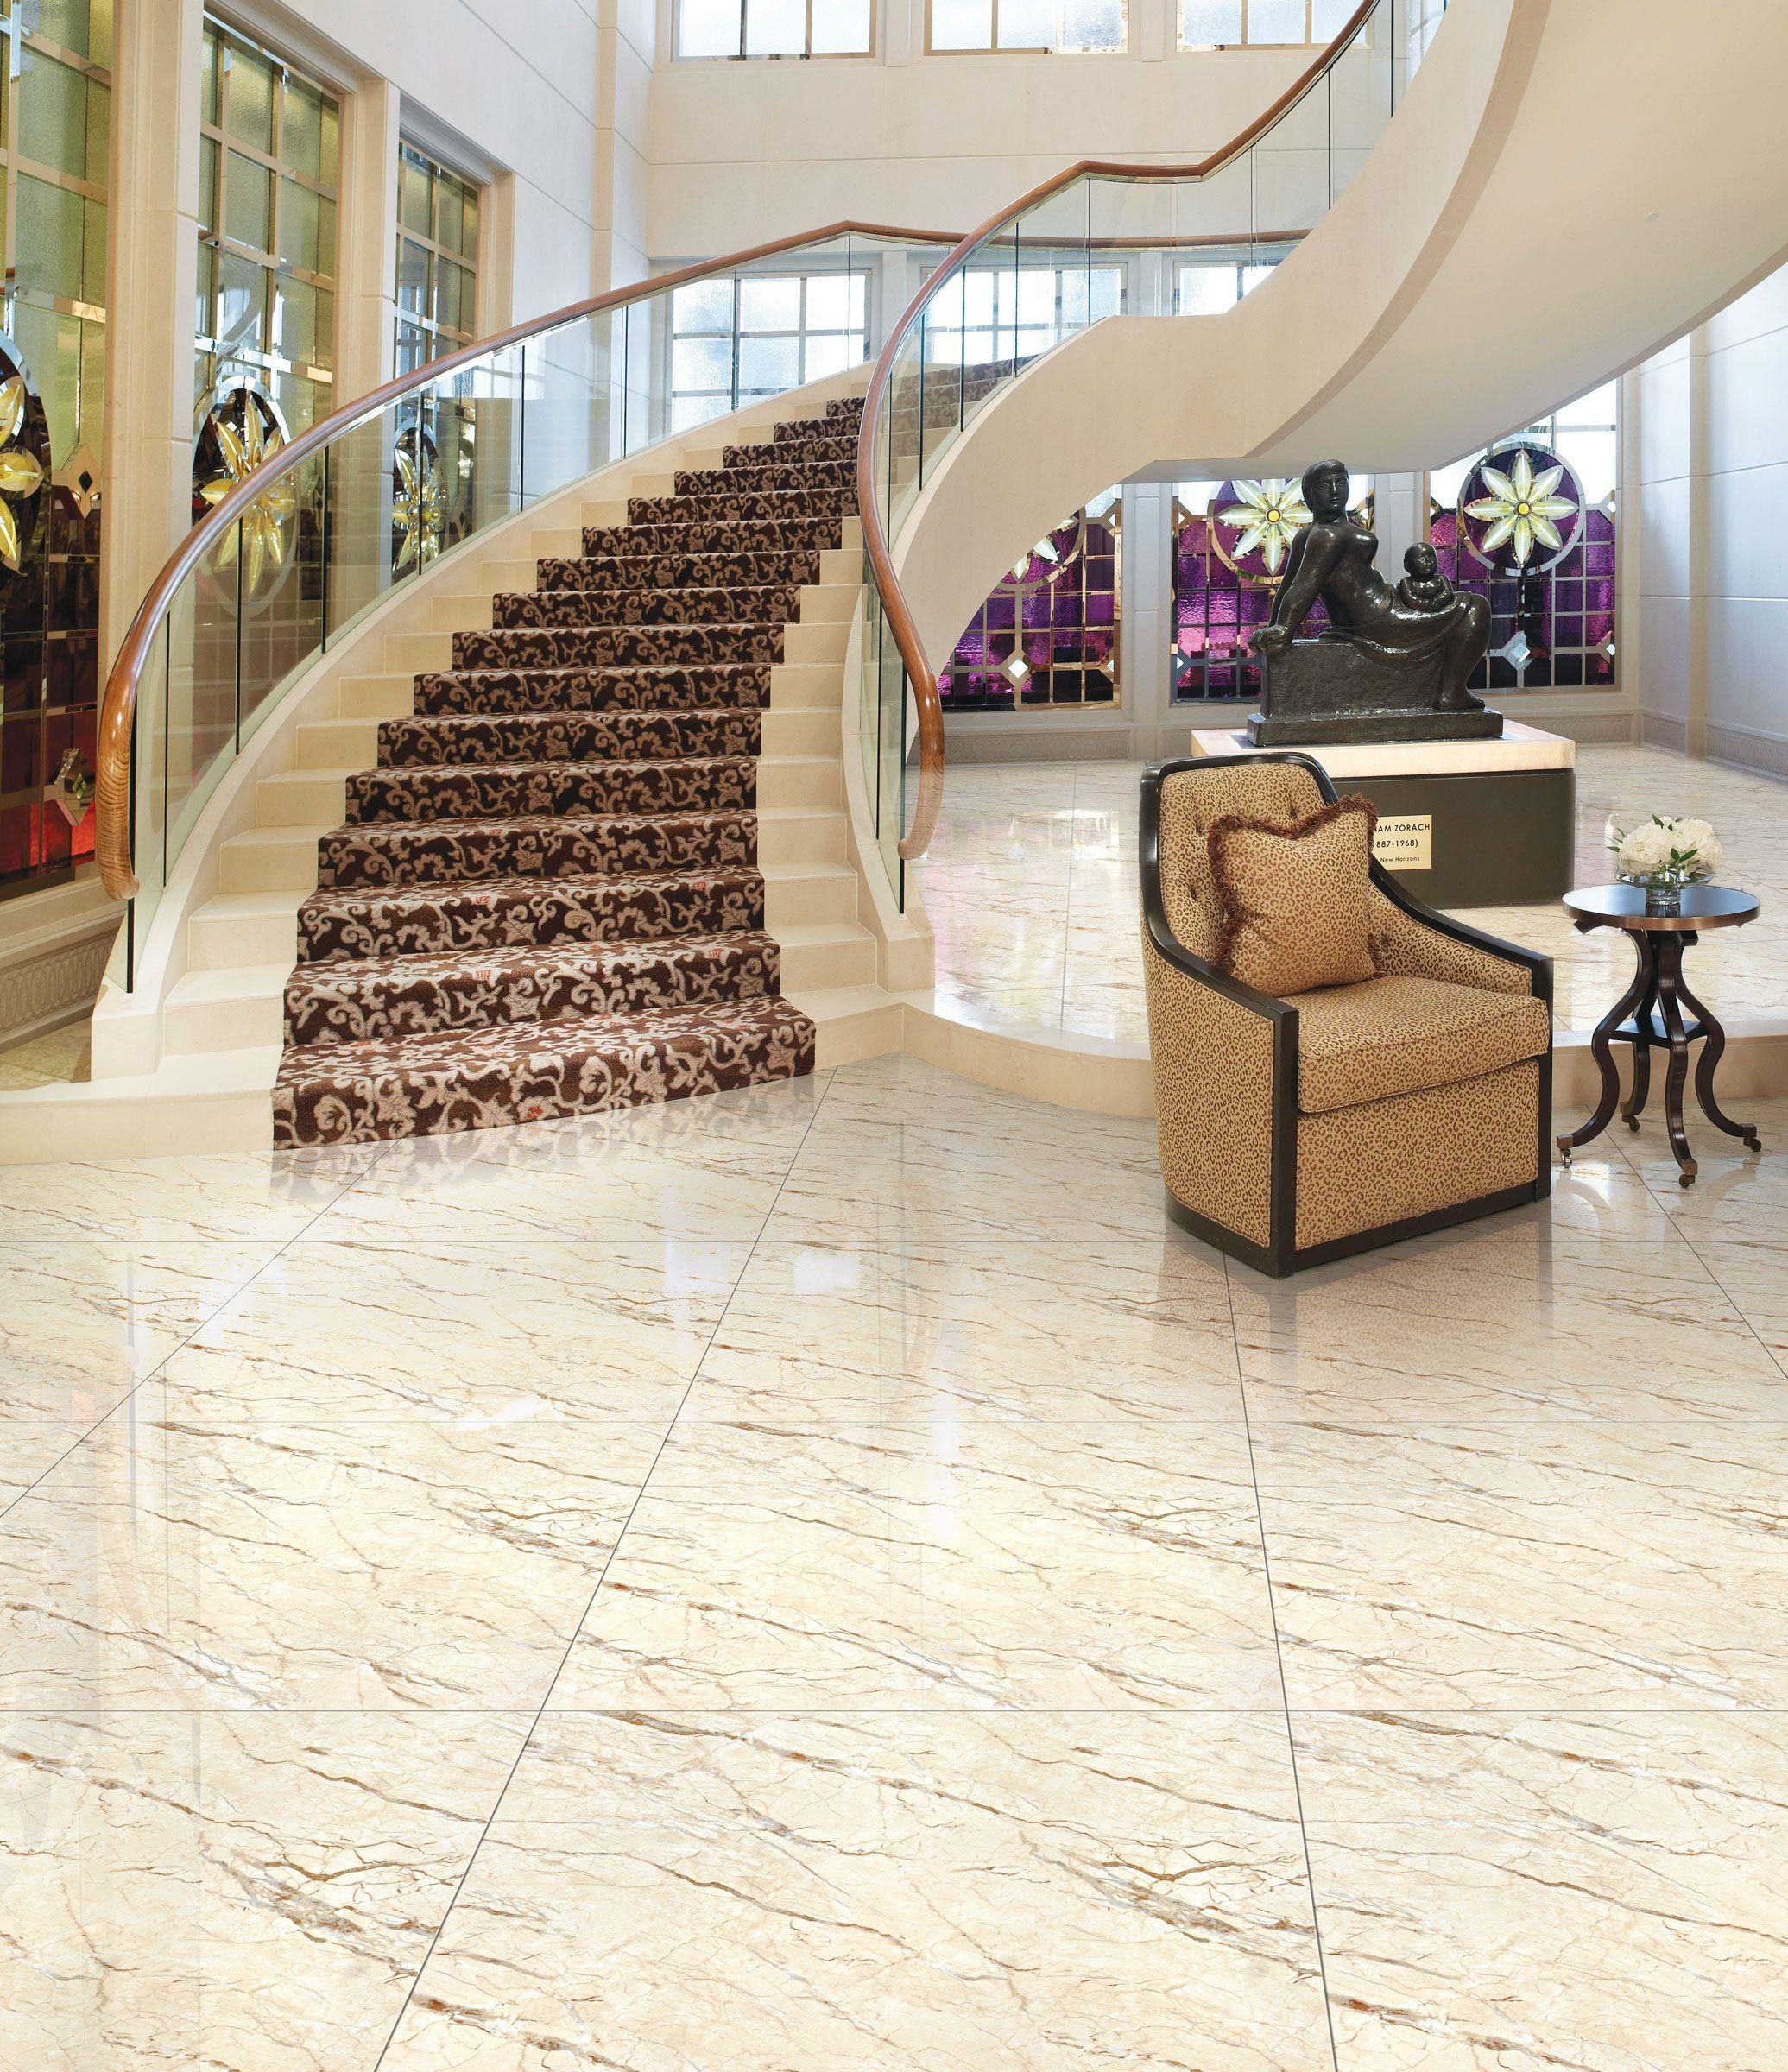 The Best Latest Floor Tiles Design In India And Review In 2020 Tile Design Bedroom Floor Tiles Living Room Tiles